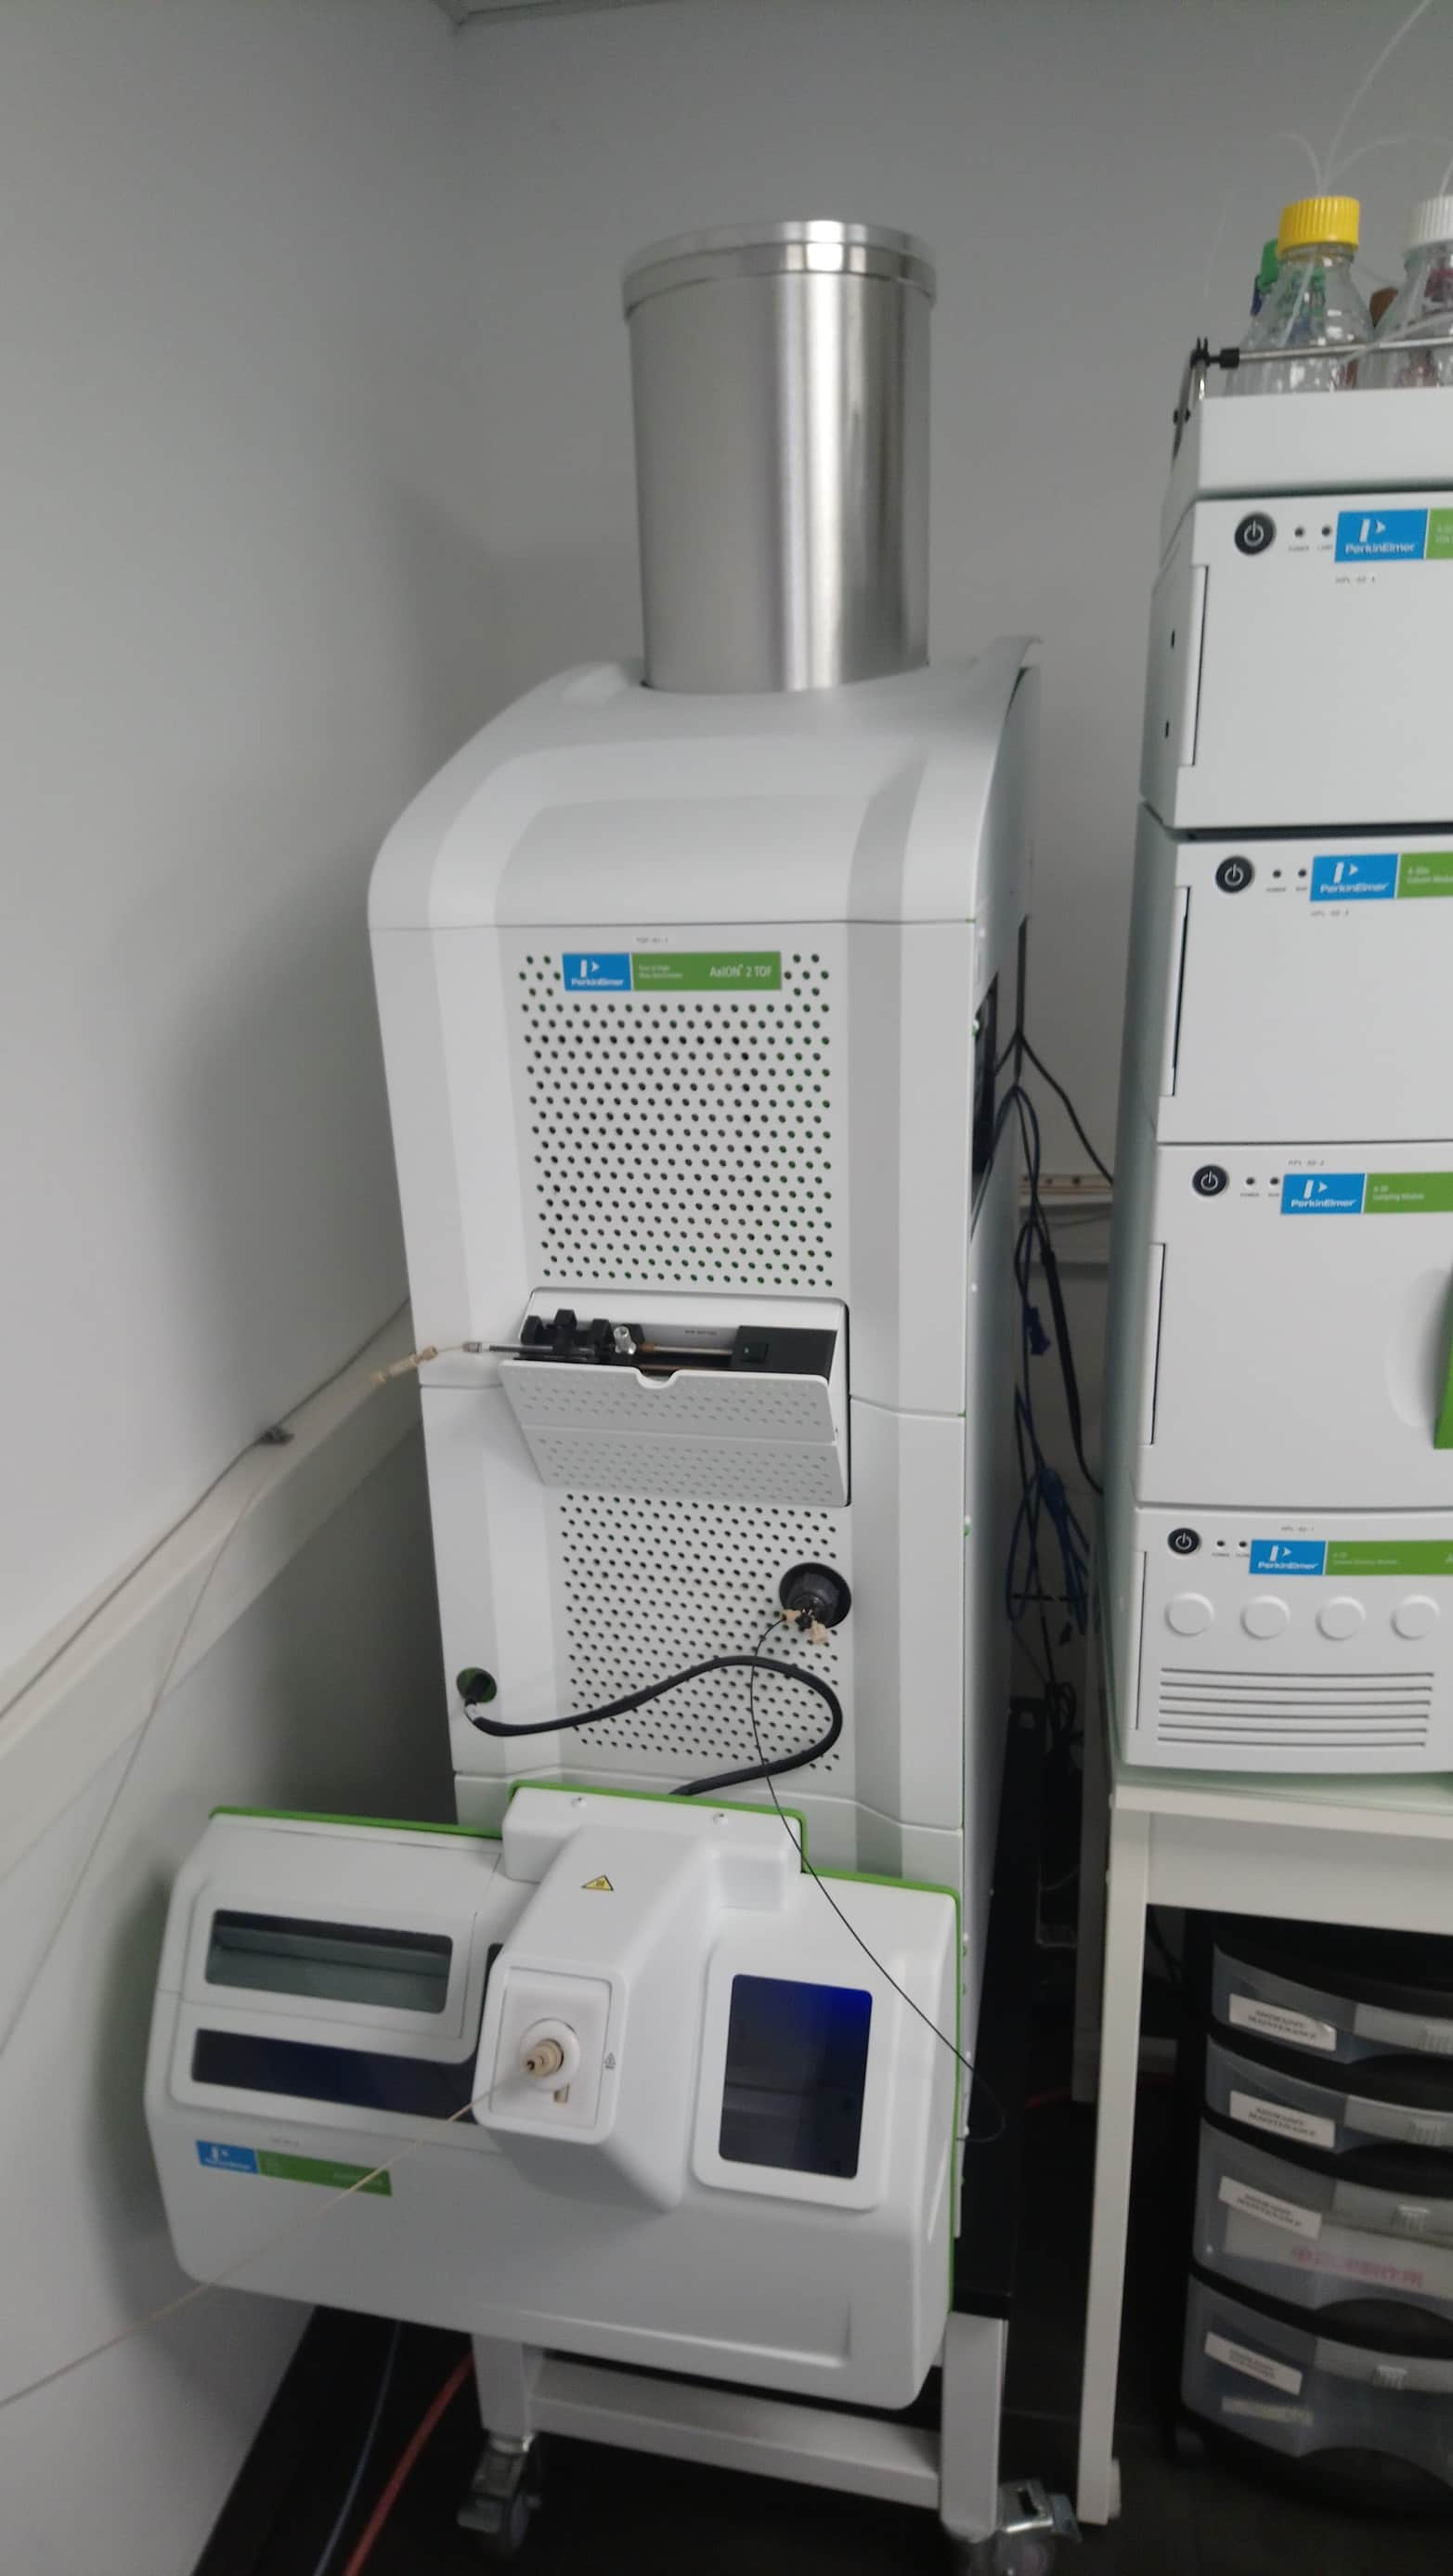 Perkin Elmer Axion 2 TOF Liquid Chromatography Mass Spectrometry (LC/MS)